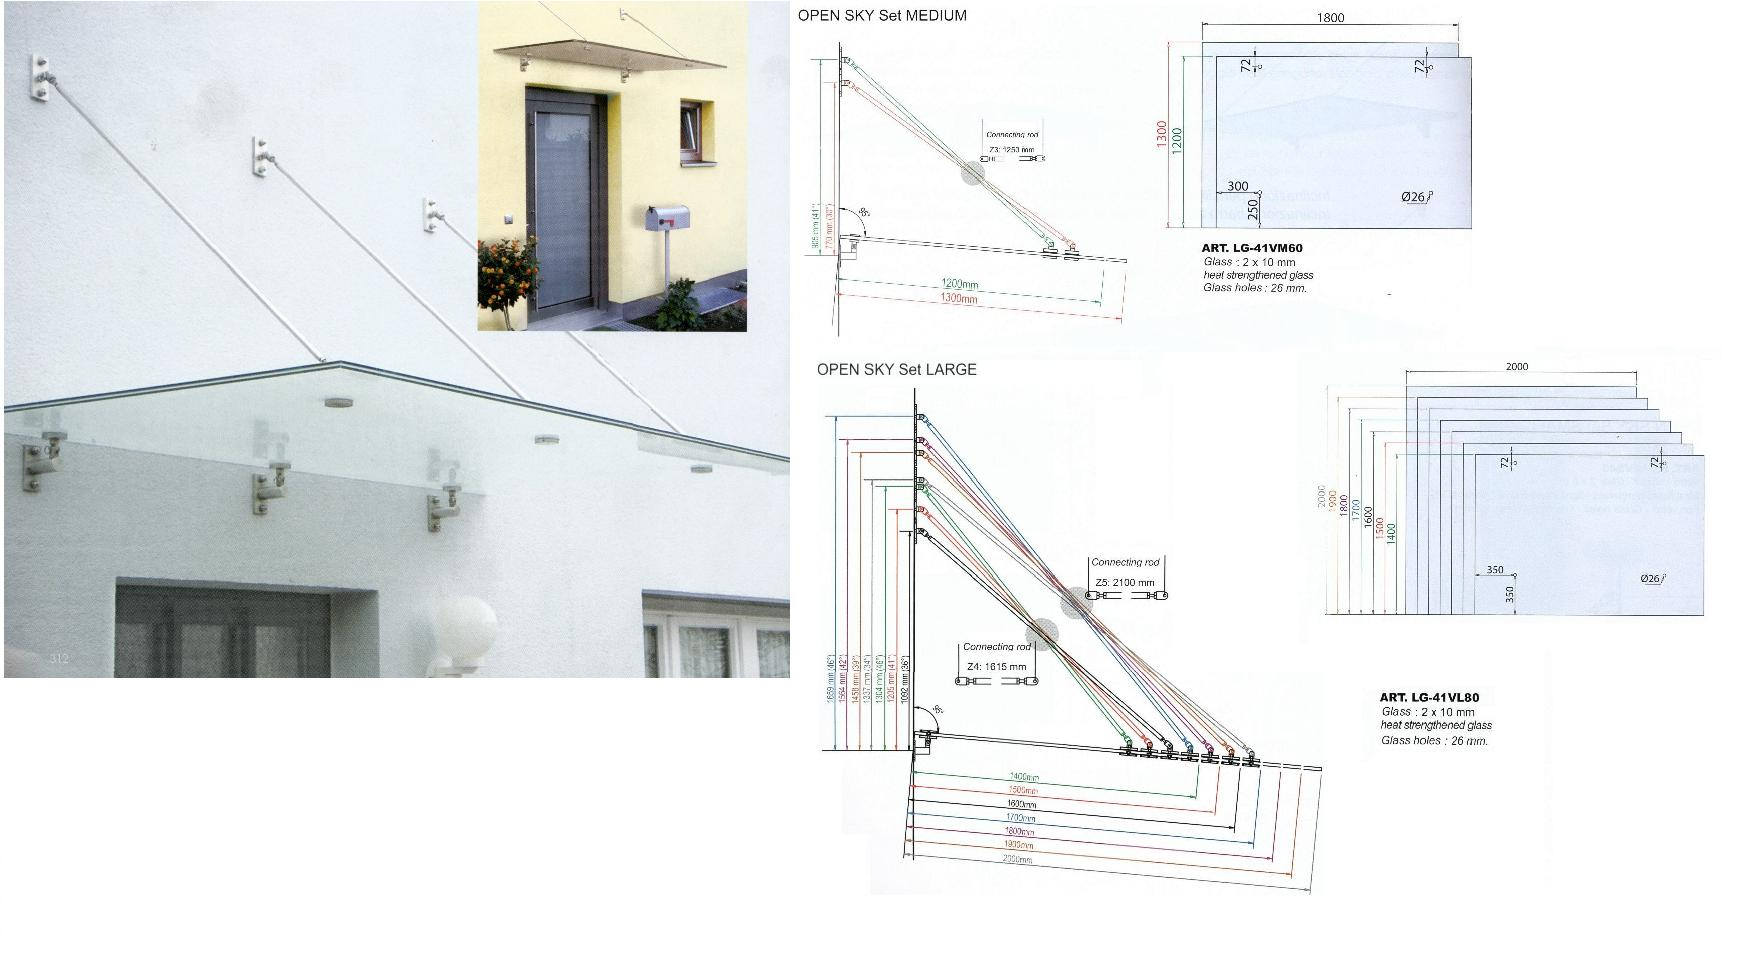 Open Sky Glass Canopy System Andrew Vassallo General Trading